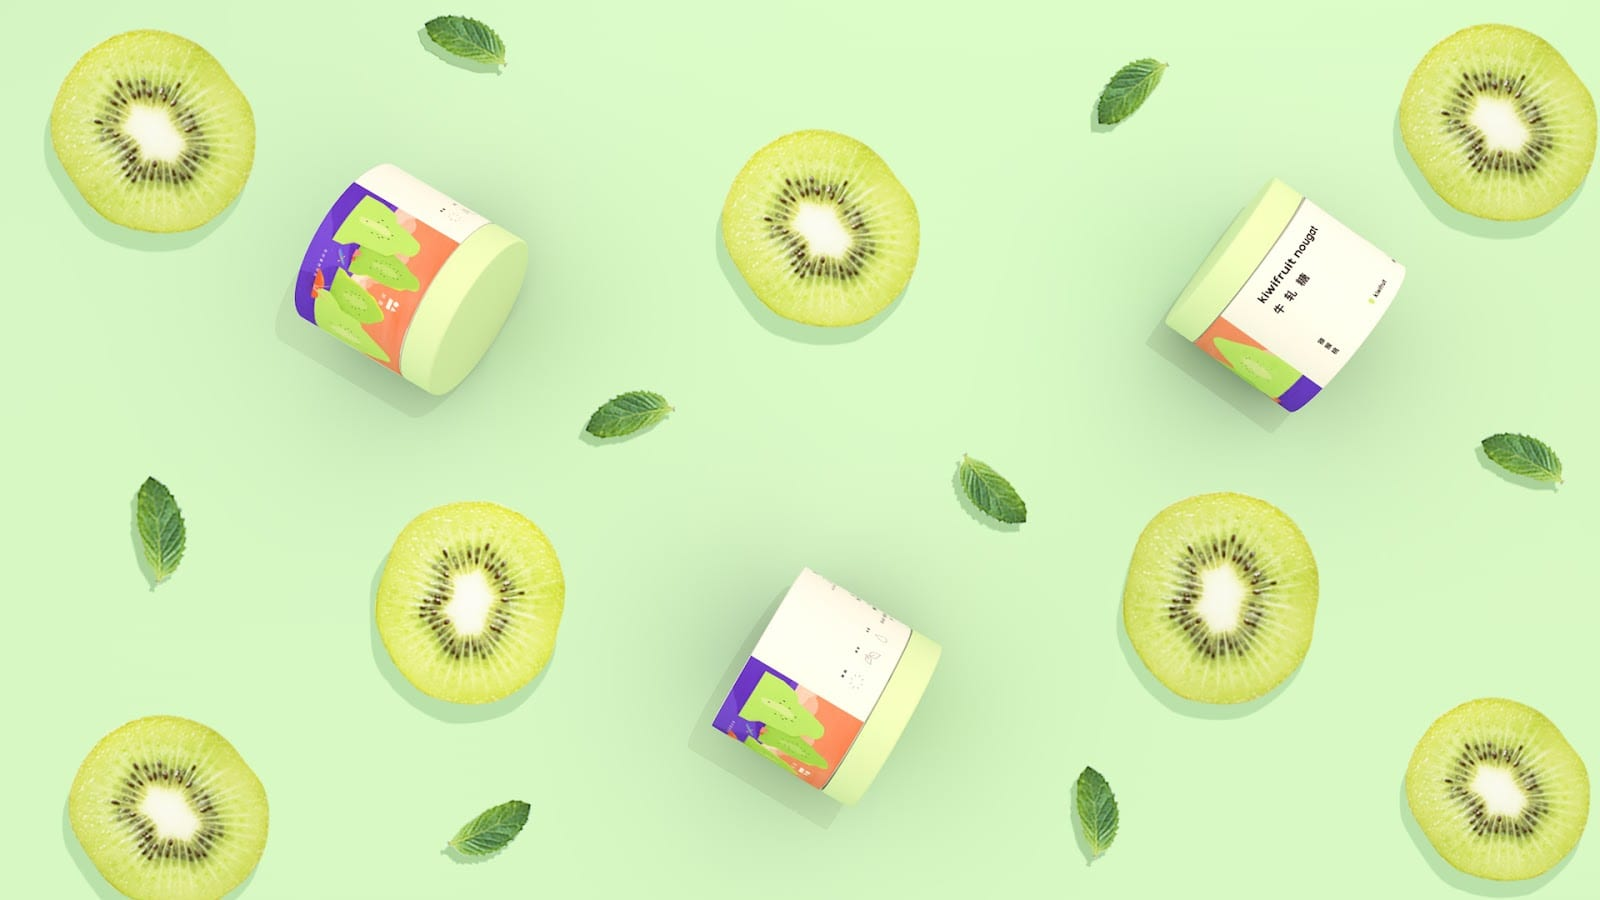 fruit tea 21 1 - Ach, tie obaly - Rango